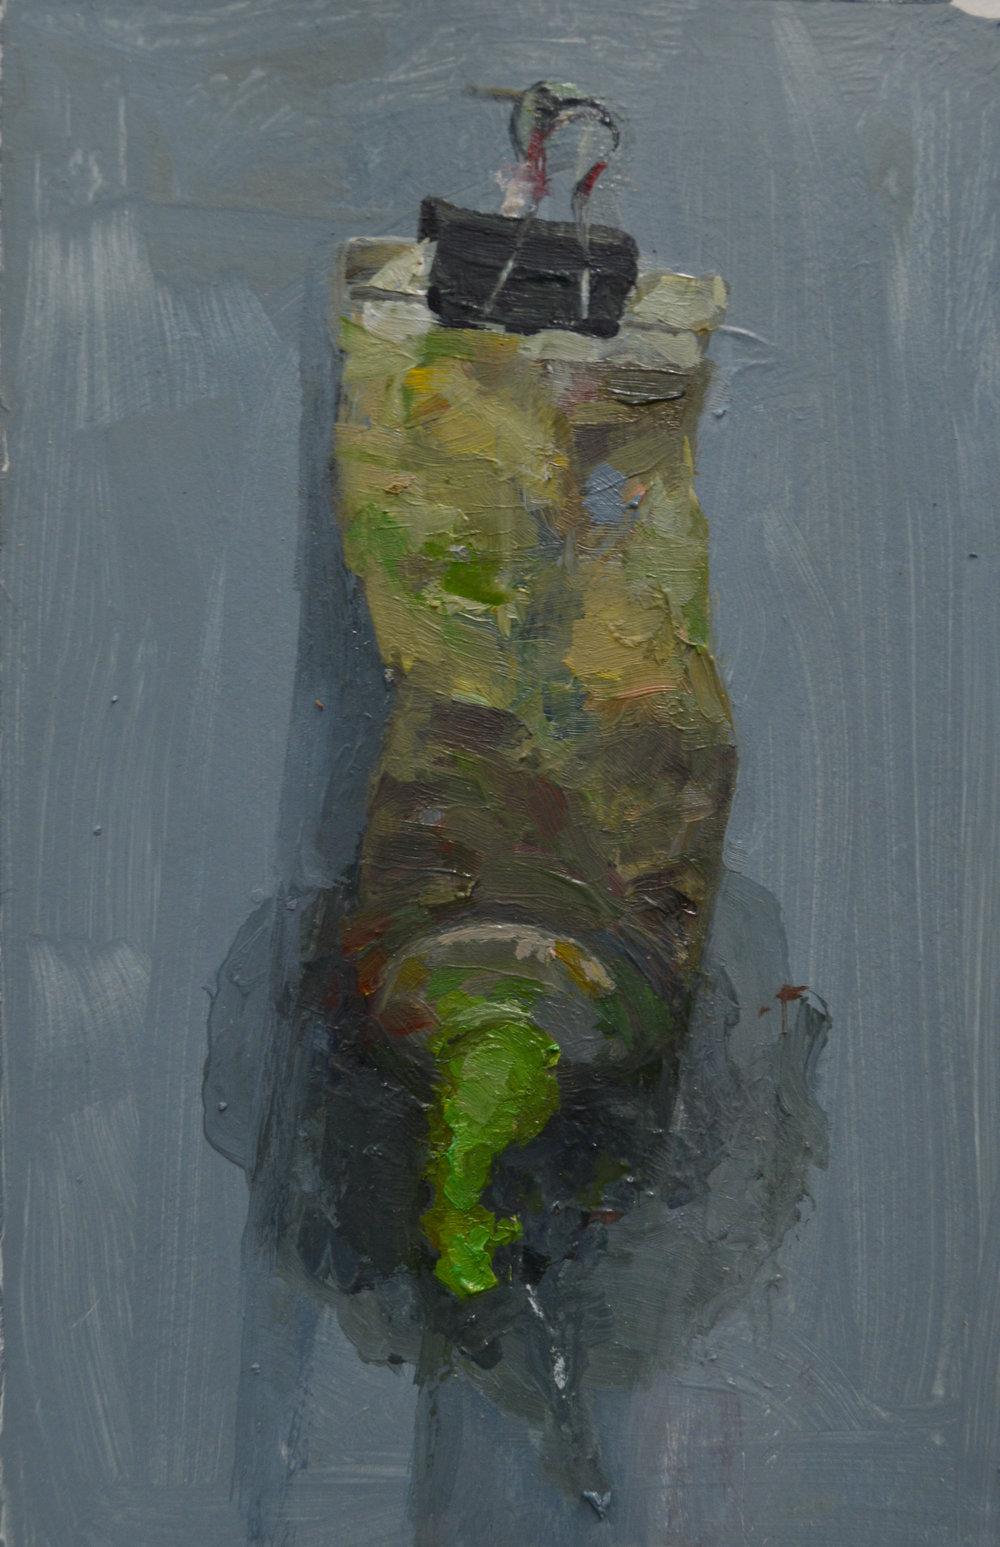 Amy-Applegate-Green Paint Tube1.JPG